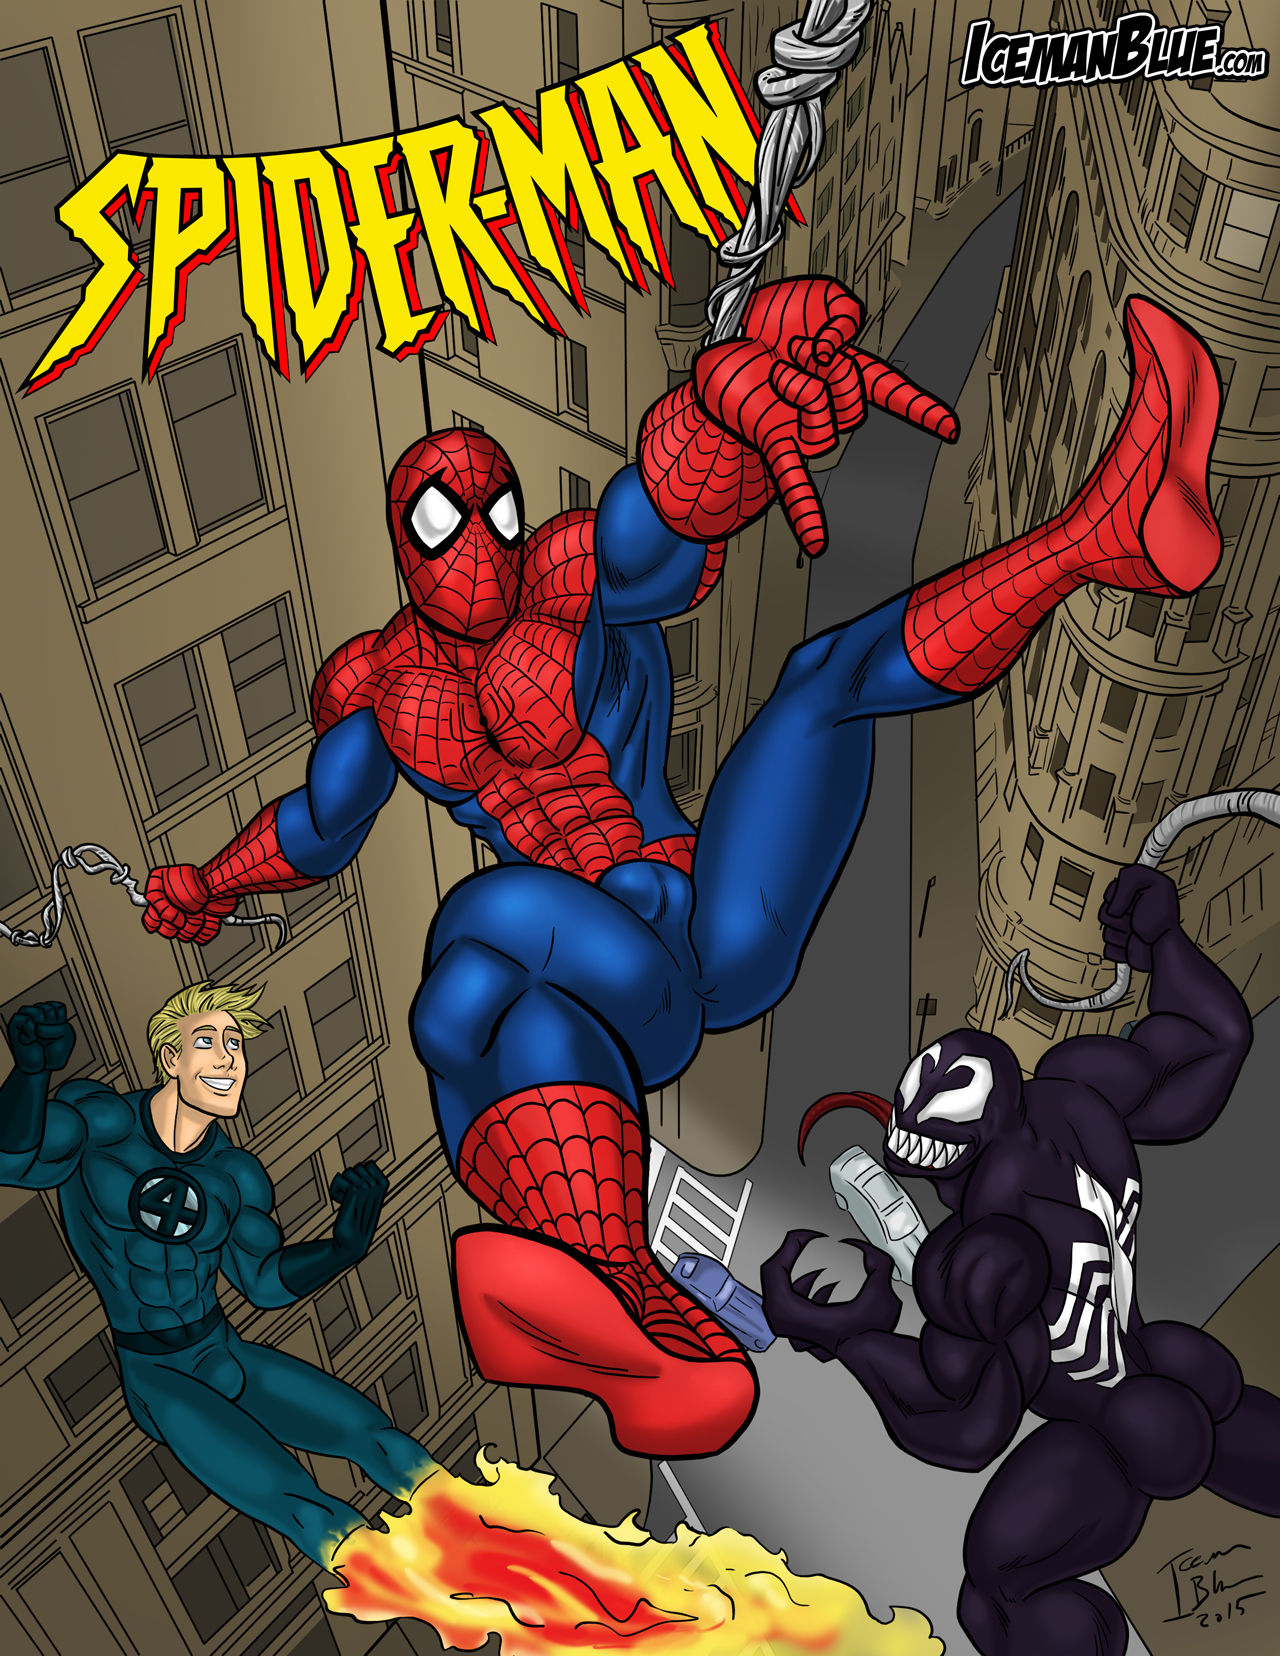 Porn Comics - Spider-Man- Iceman Blue porn comics 8 muses